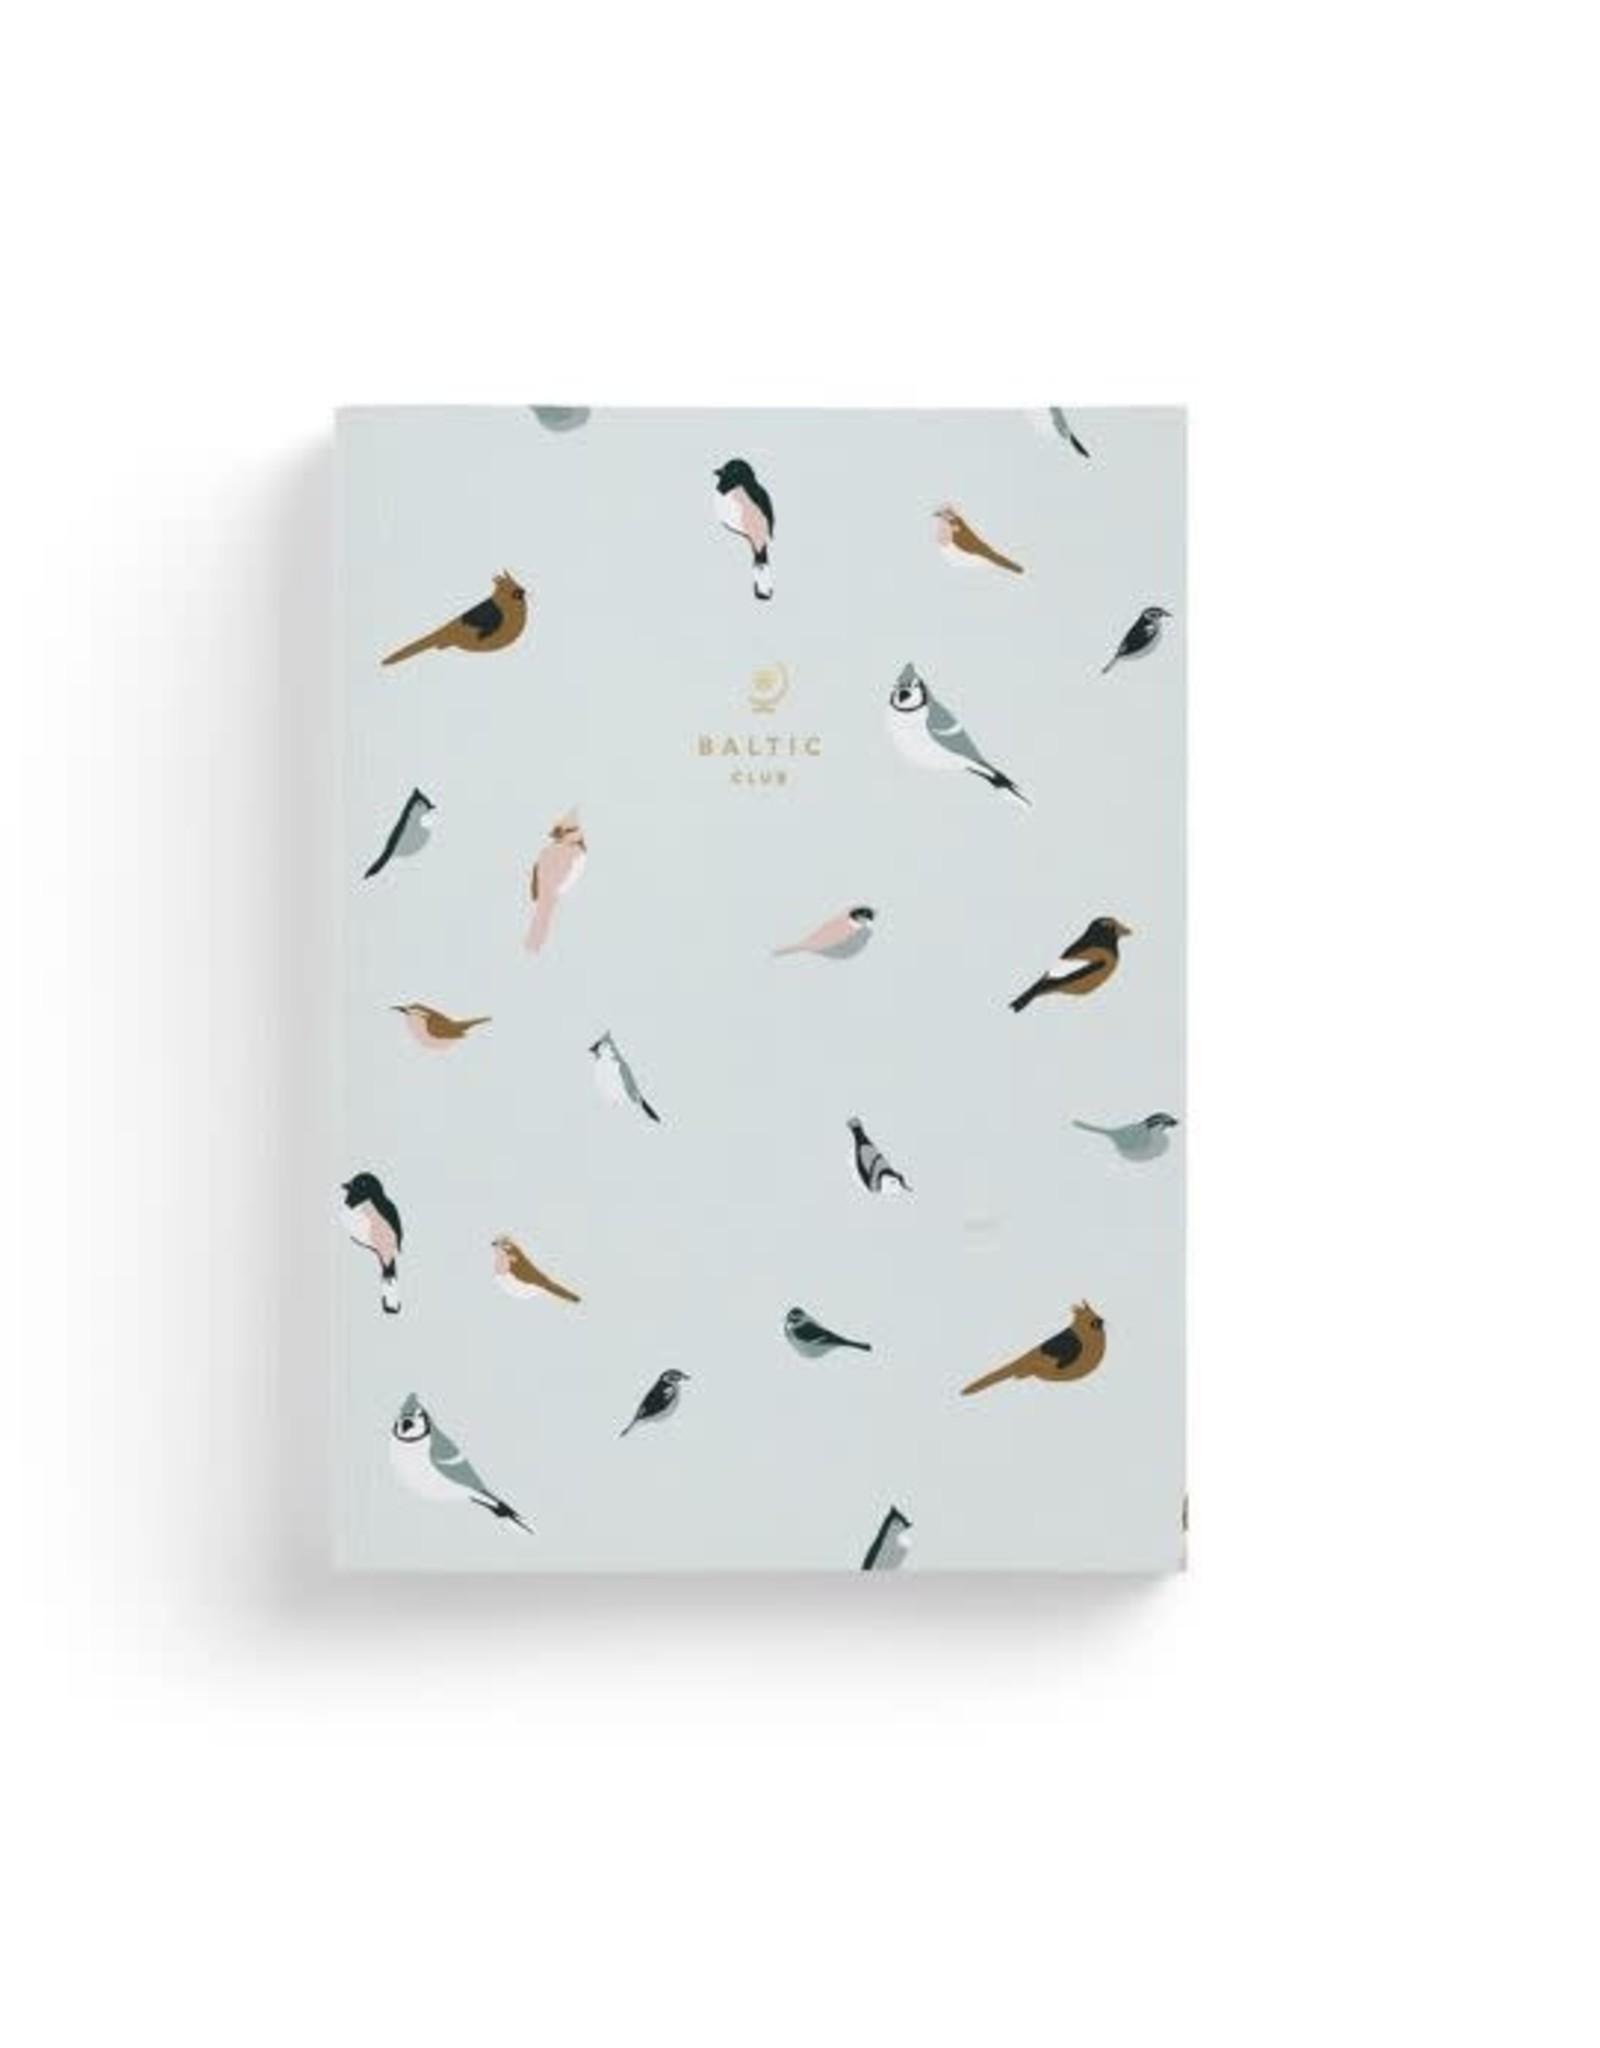 Baltic Club Notebook : Oiseaux / Birds